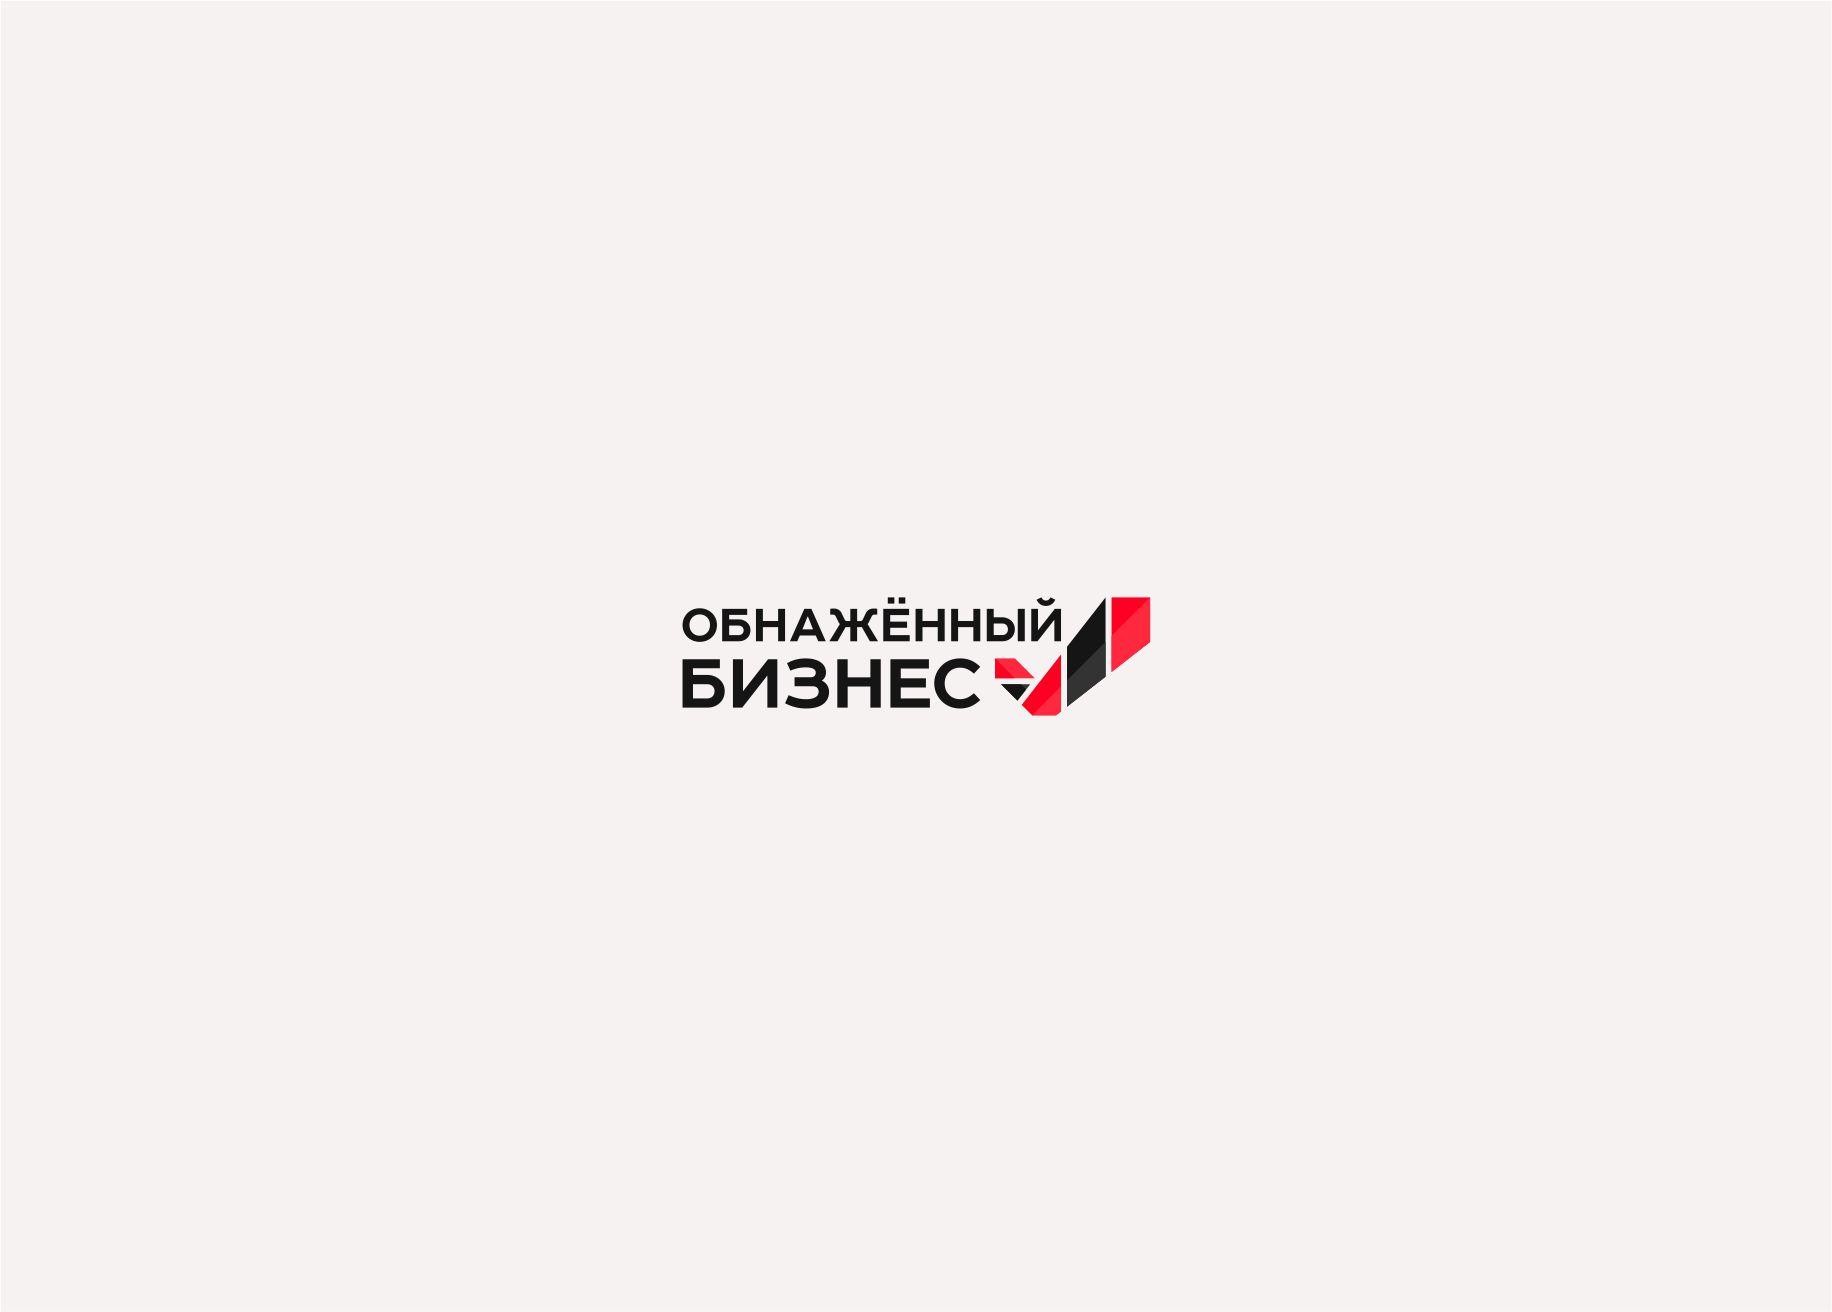 "Логотип для продюсерского центра ""Обнажённый бизнес"" фото f_9495b9cc22189eda.jpg"